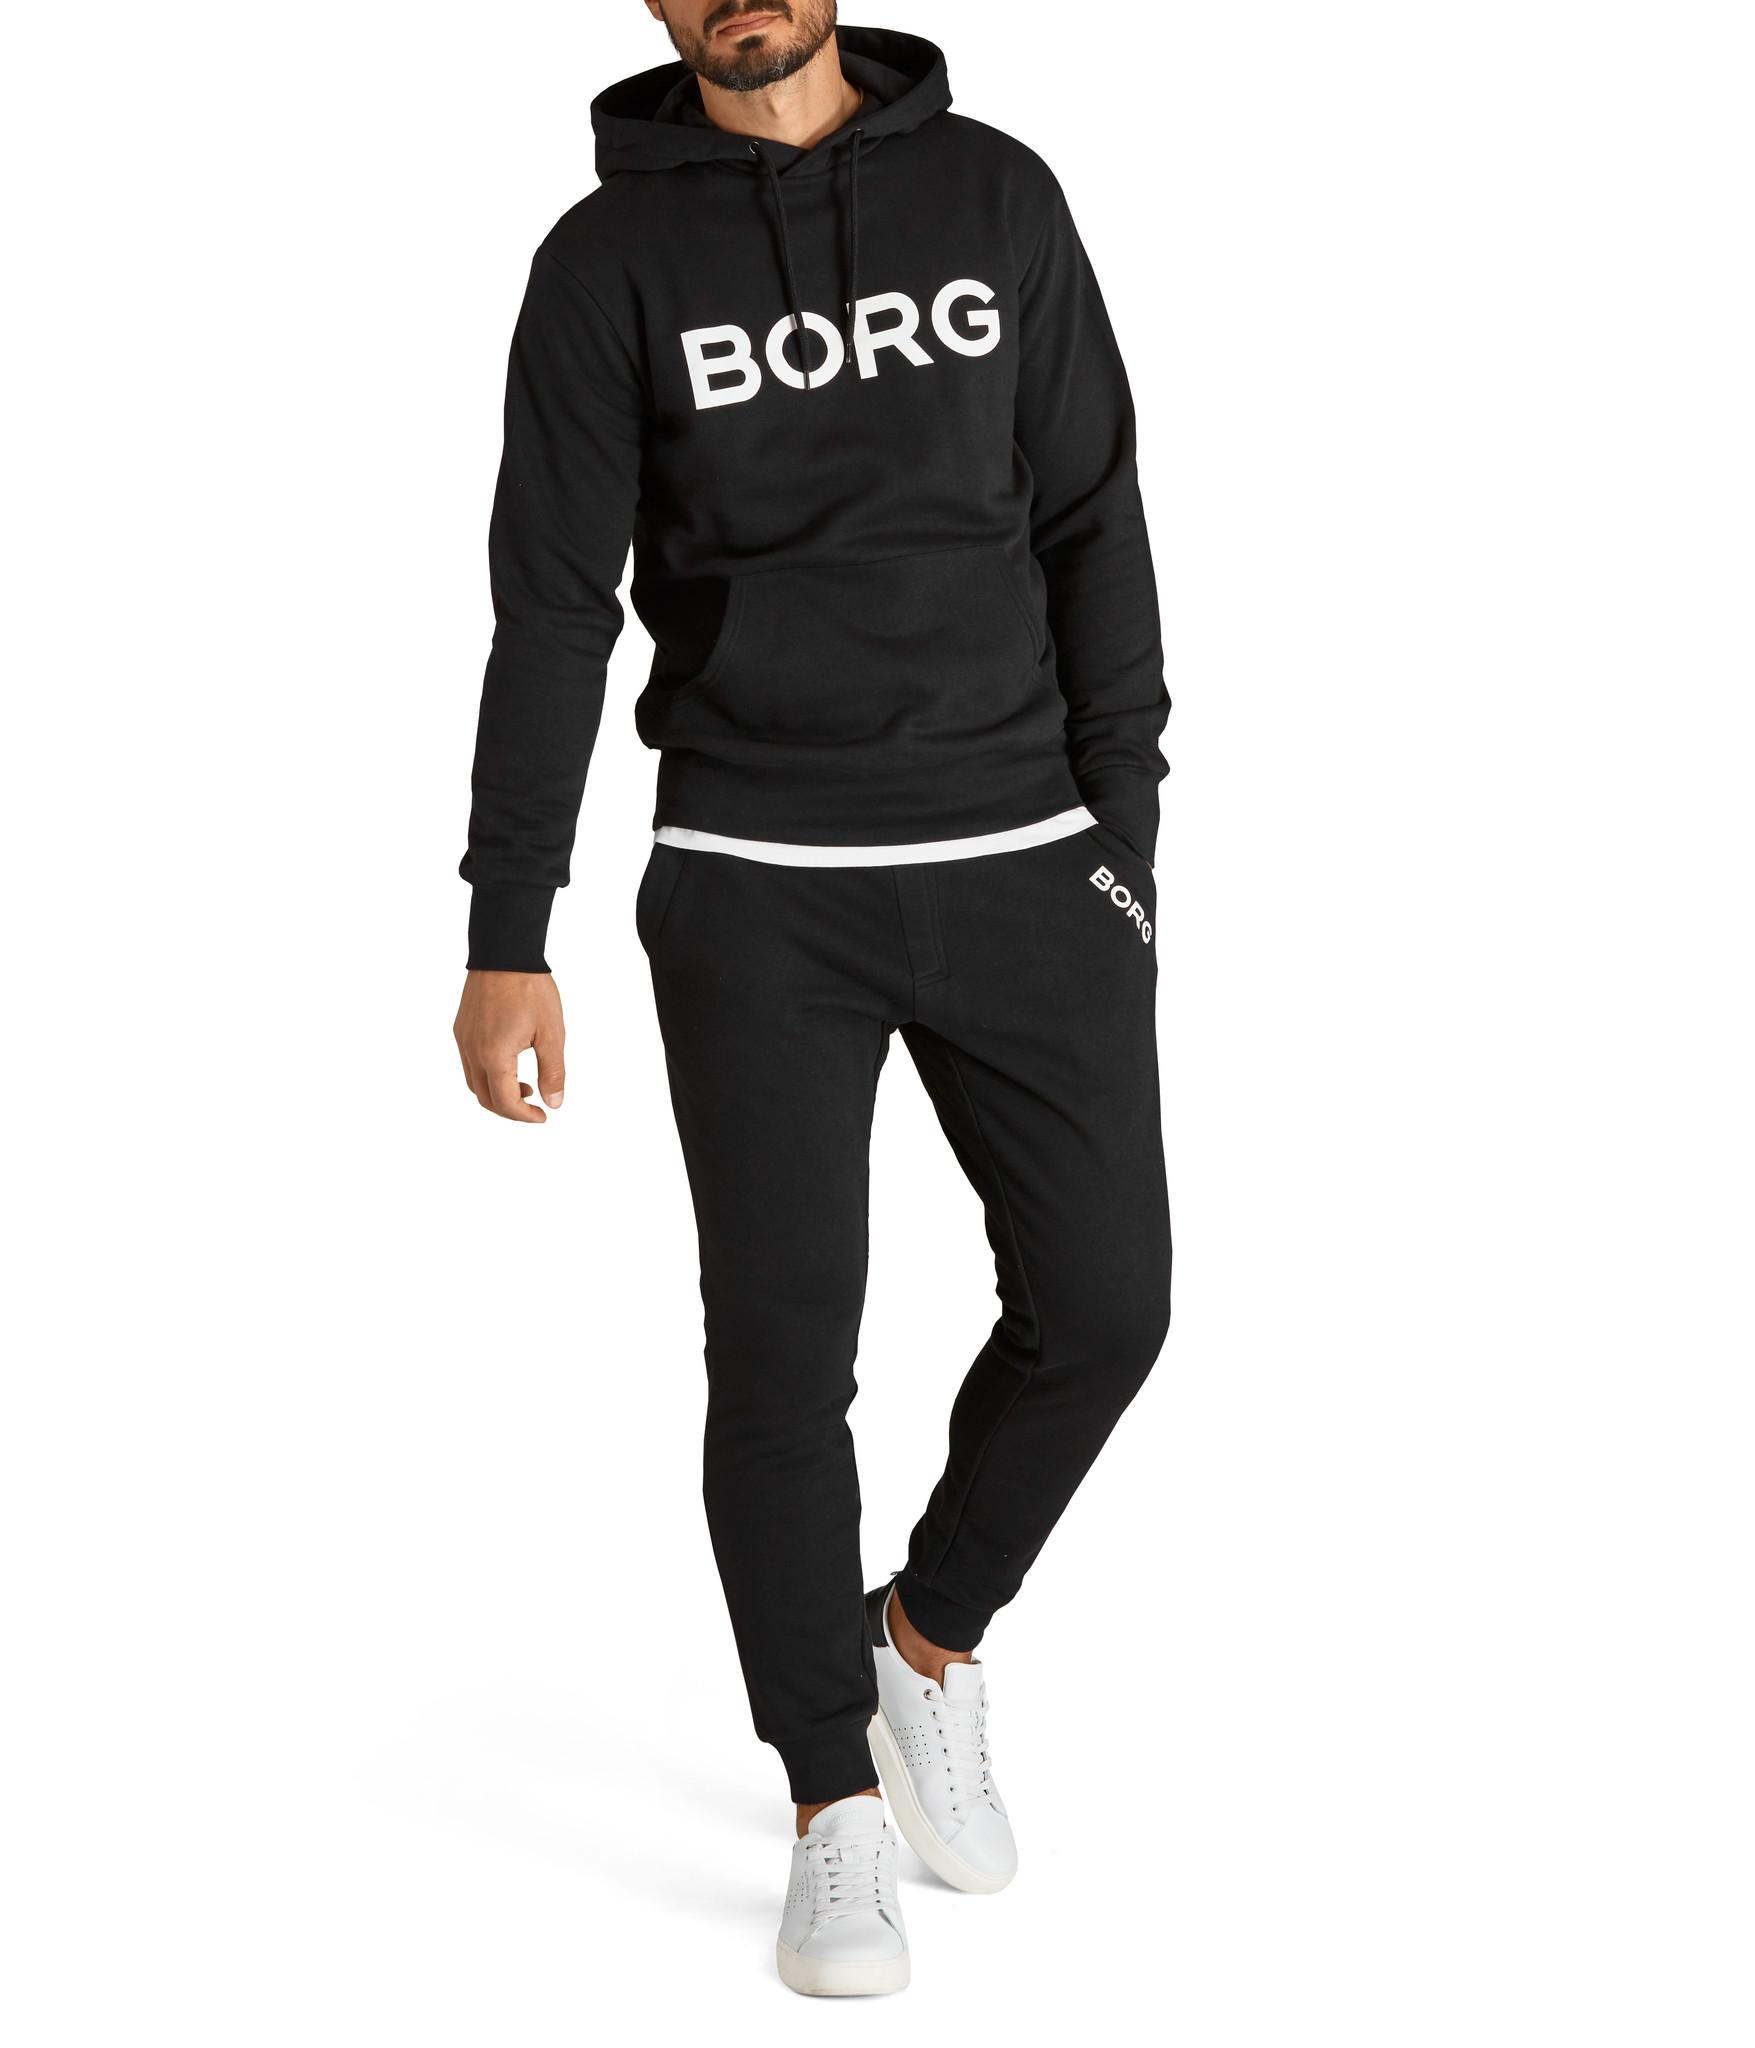 Bjorn Borg Jogging Bjorn Borg 9999-1620-90651